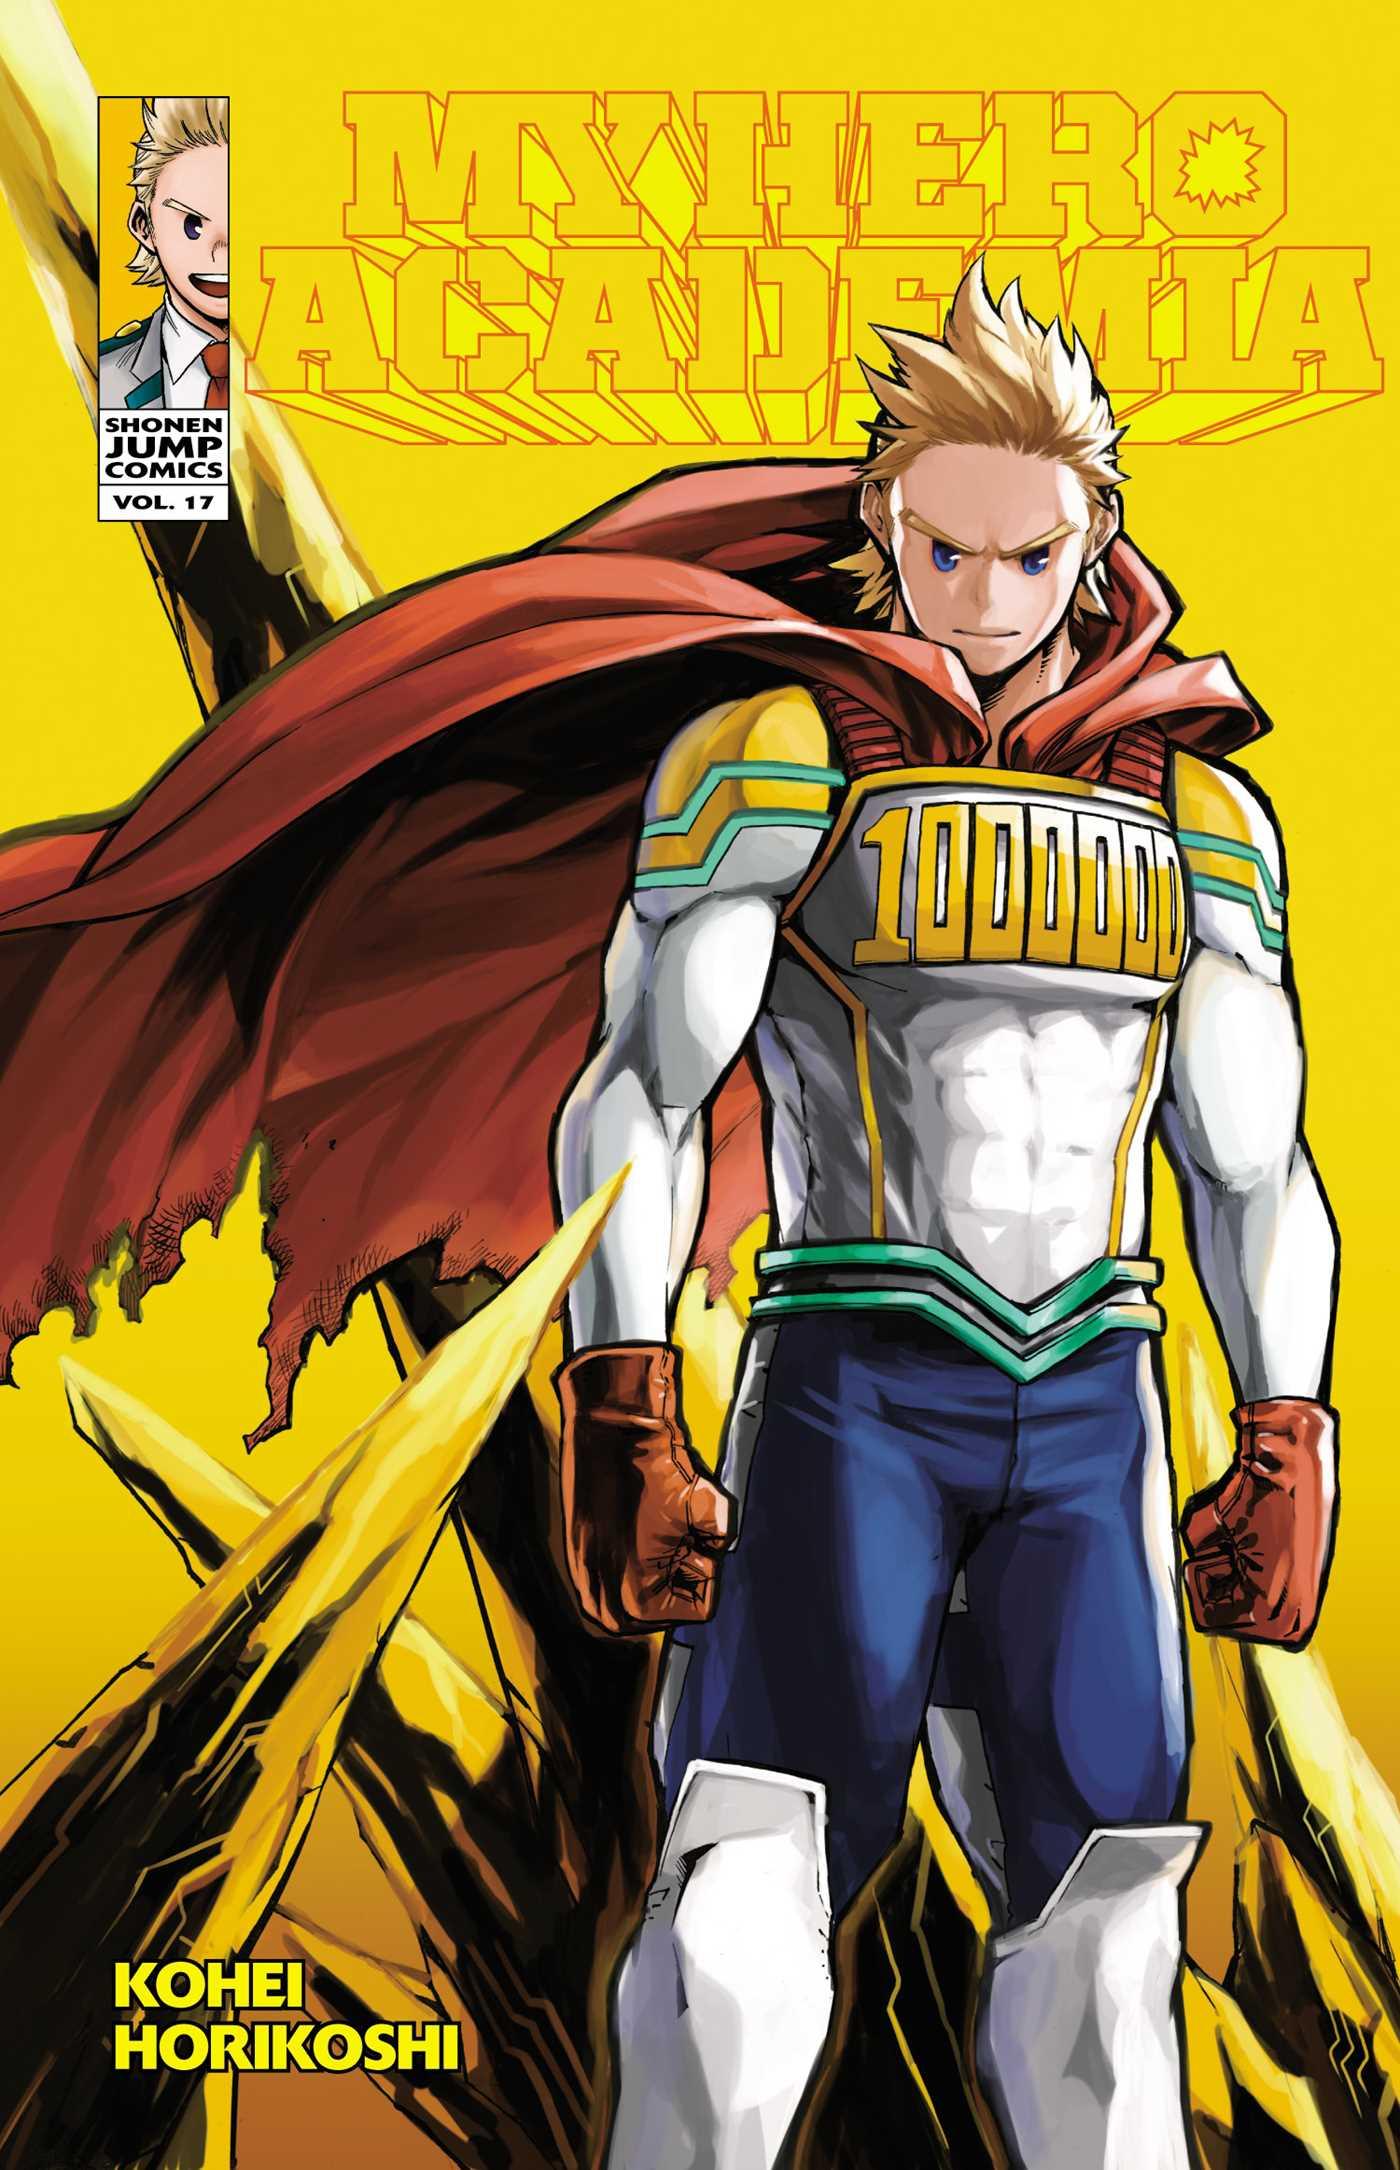 Boku no hero academia wallpaper and high quality picture gallery on minitokyo. My Hero Academia Manga Vol. 17 @Archonia_US